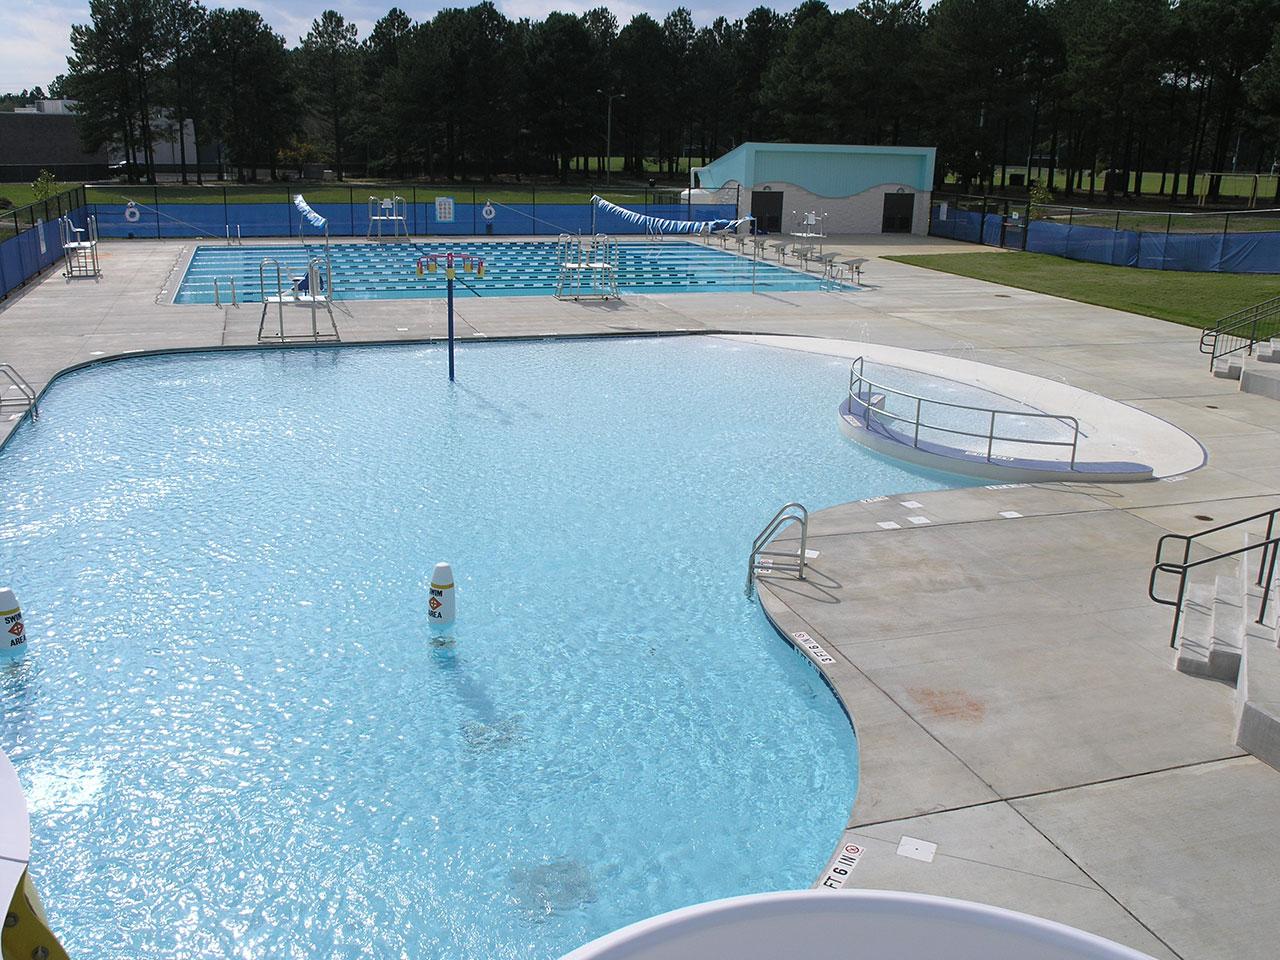 Multi Use Paddock Pool Equipment Company